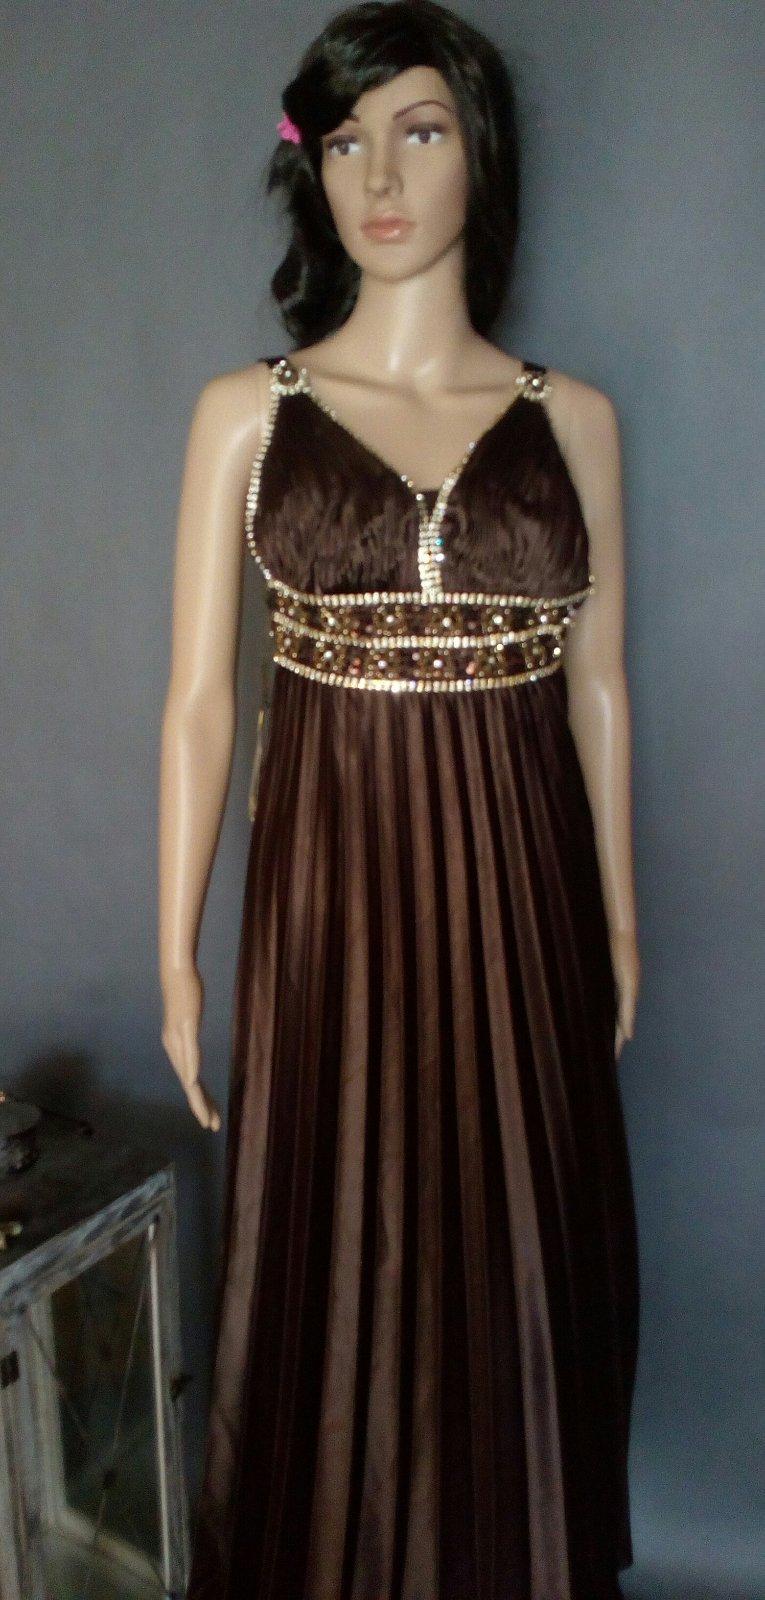 ef7b0f620dc6 G - plesové šaty